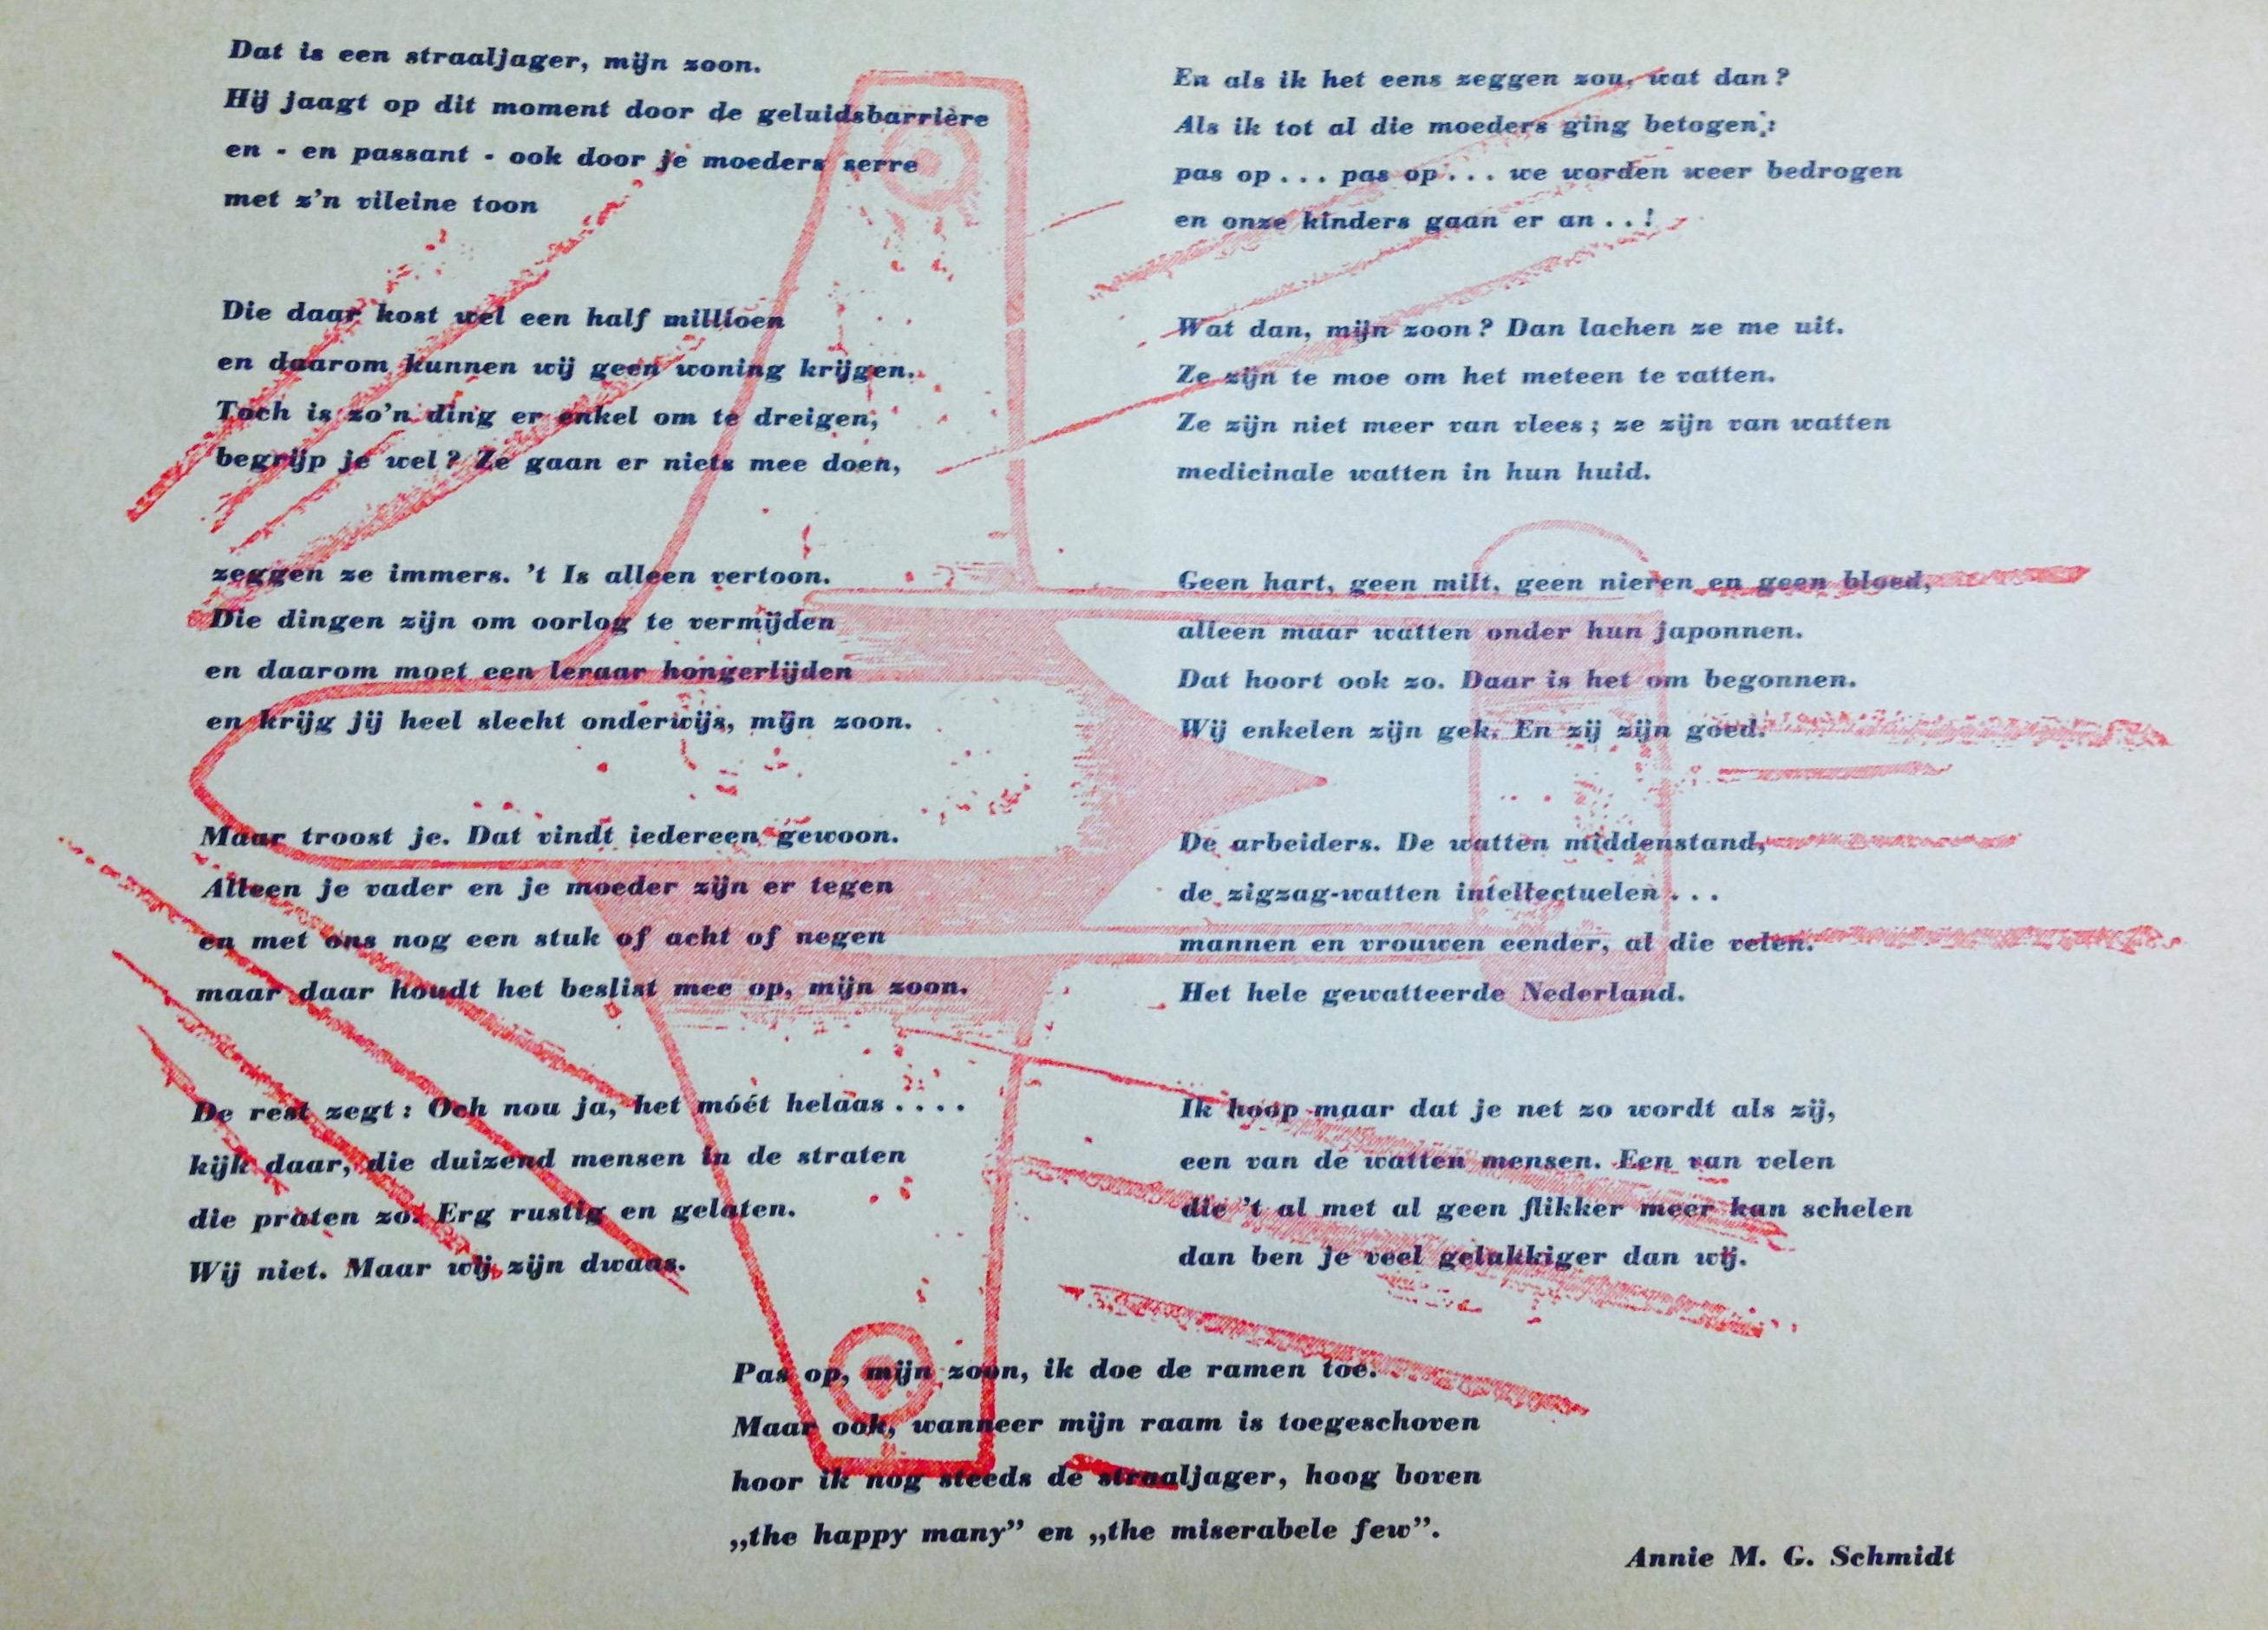 Het gedicht van Annie M.G. Schmidt.